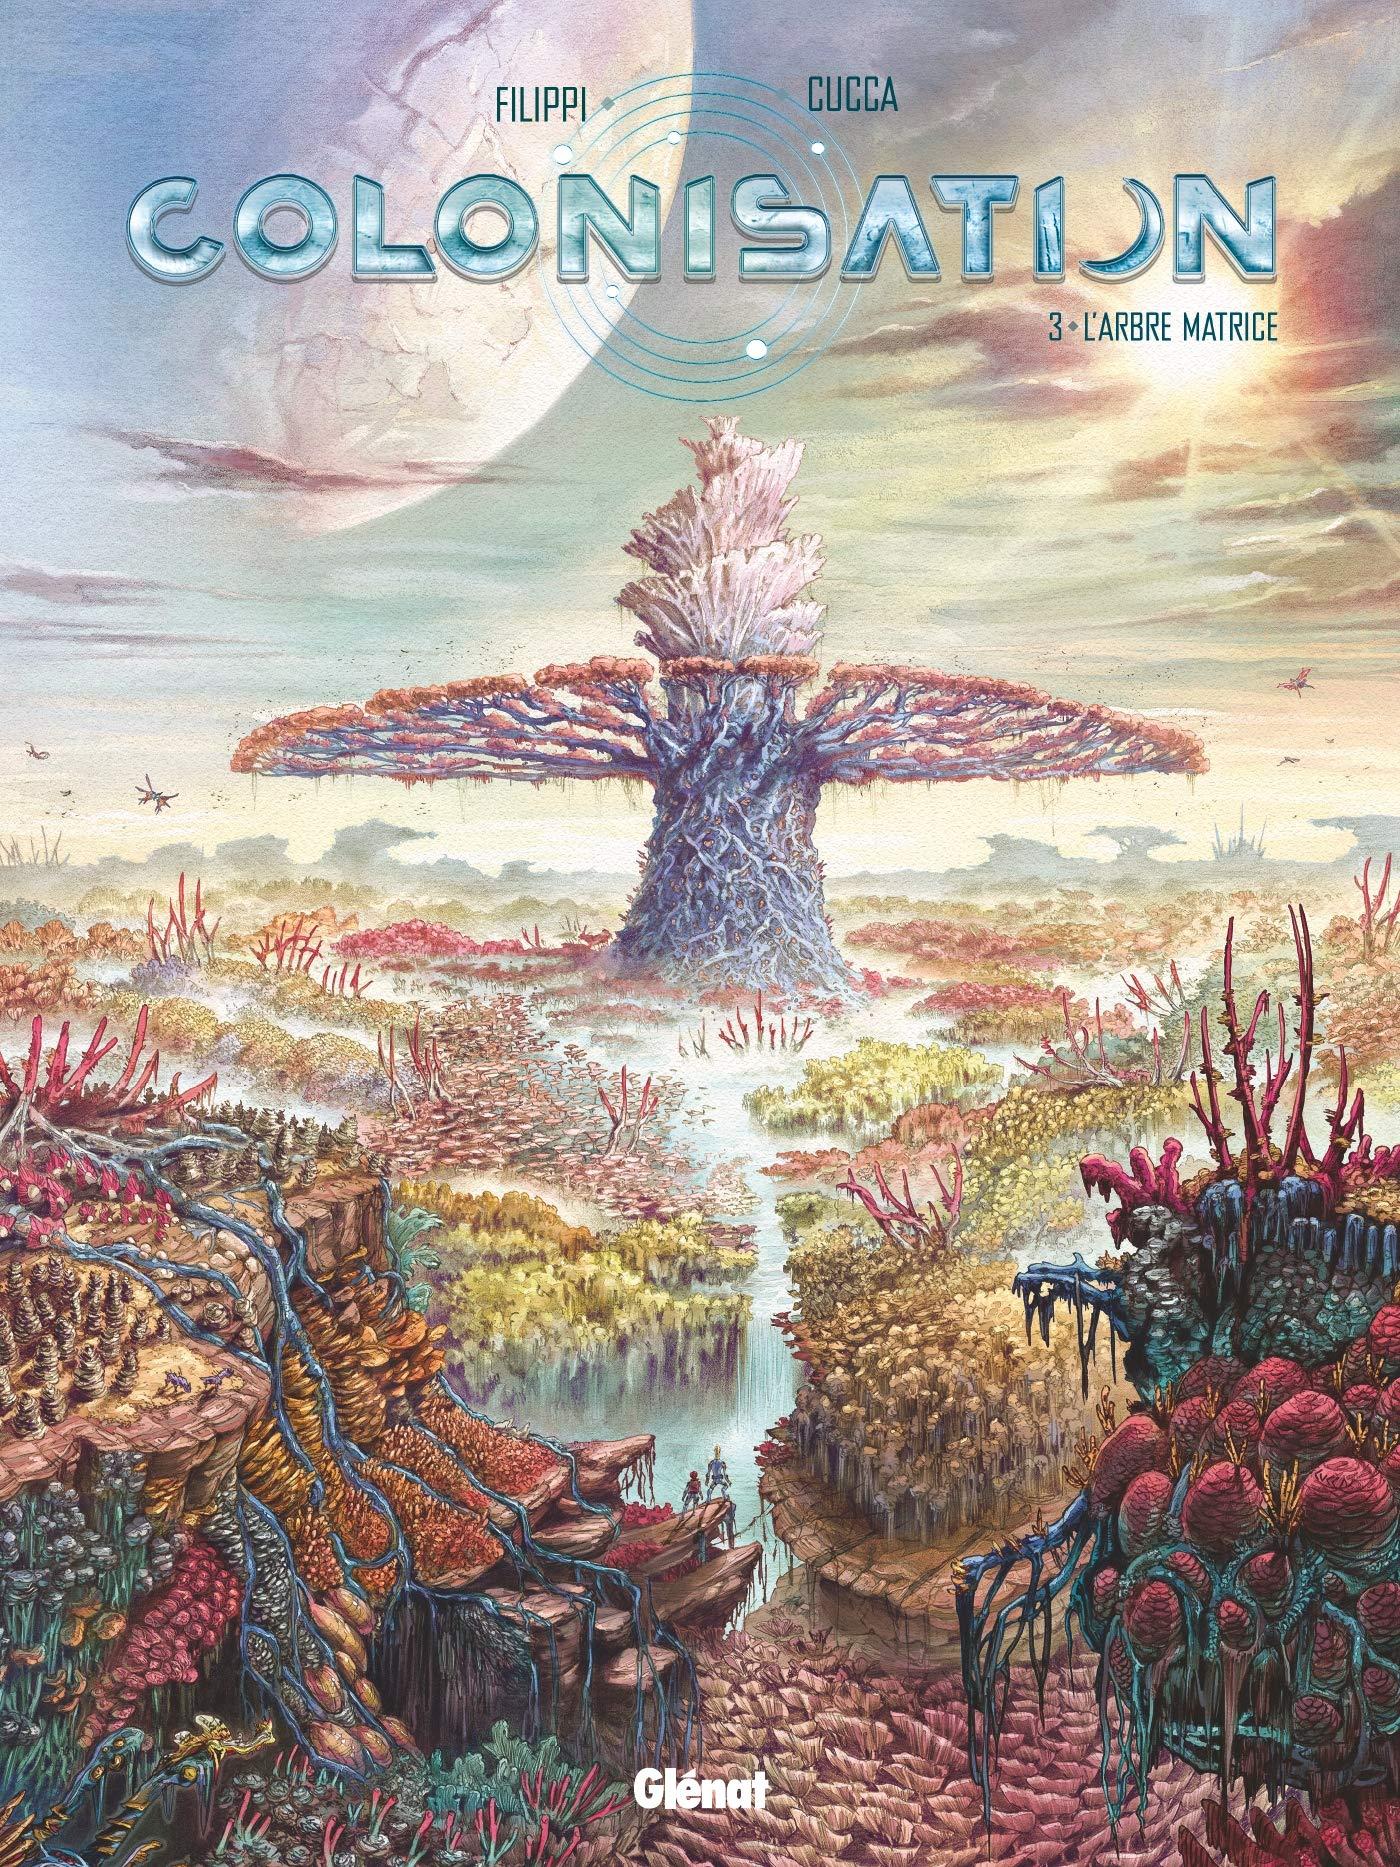 Colonisation 3 - L'arbre matrice